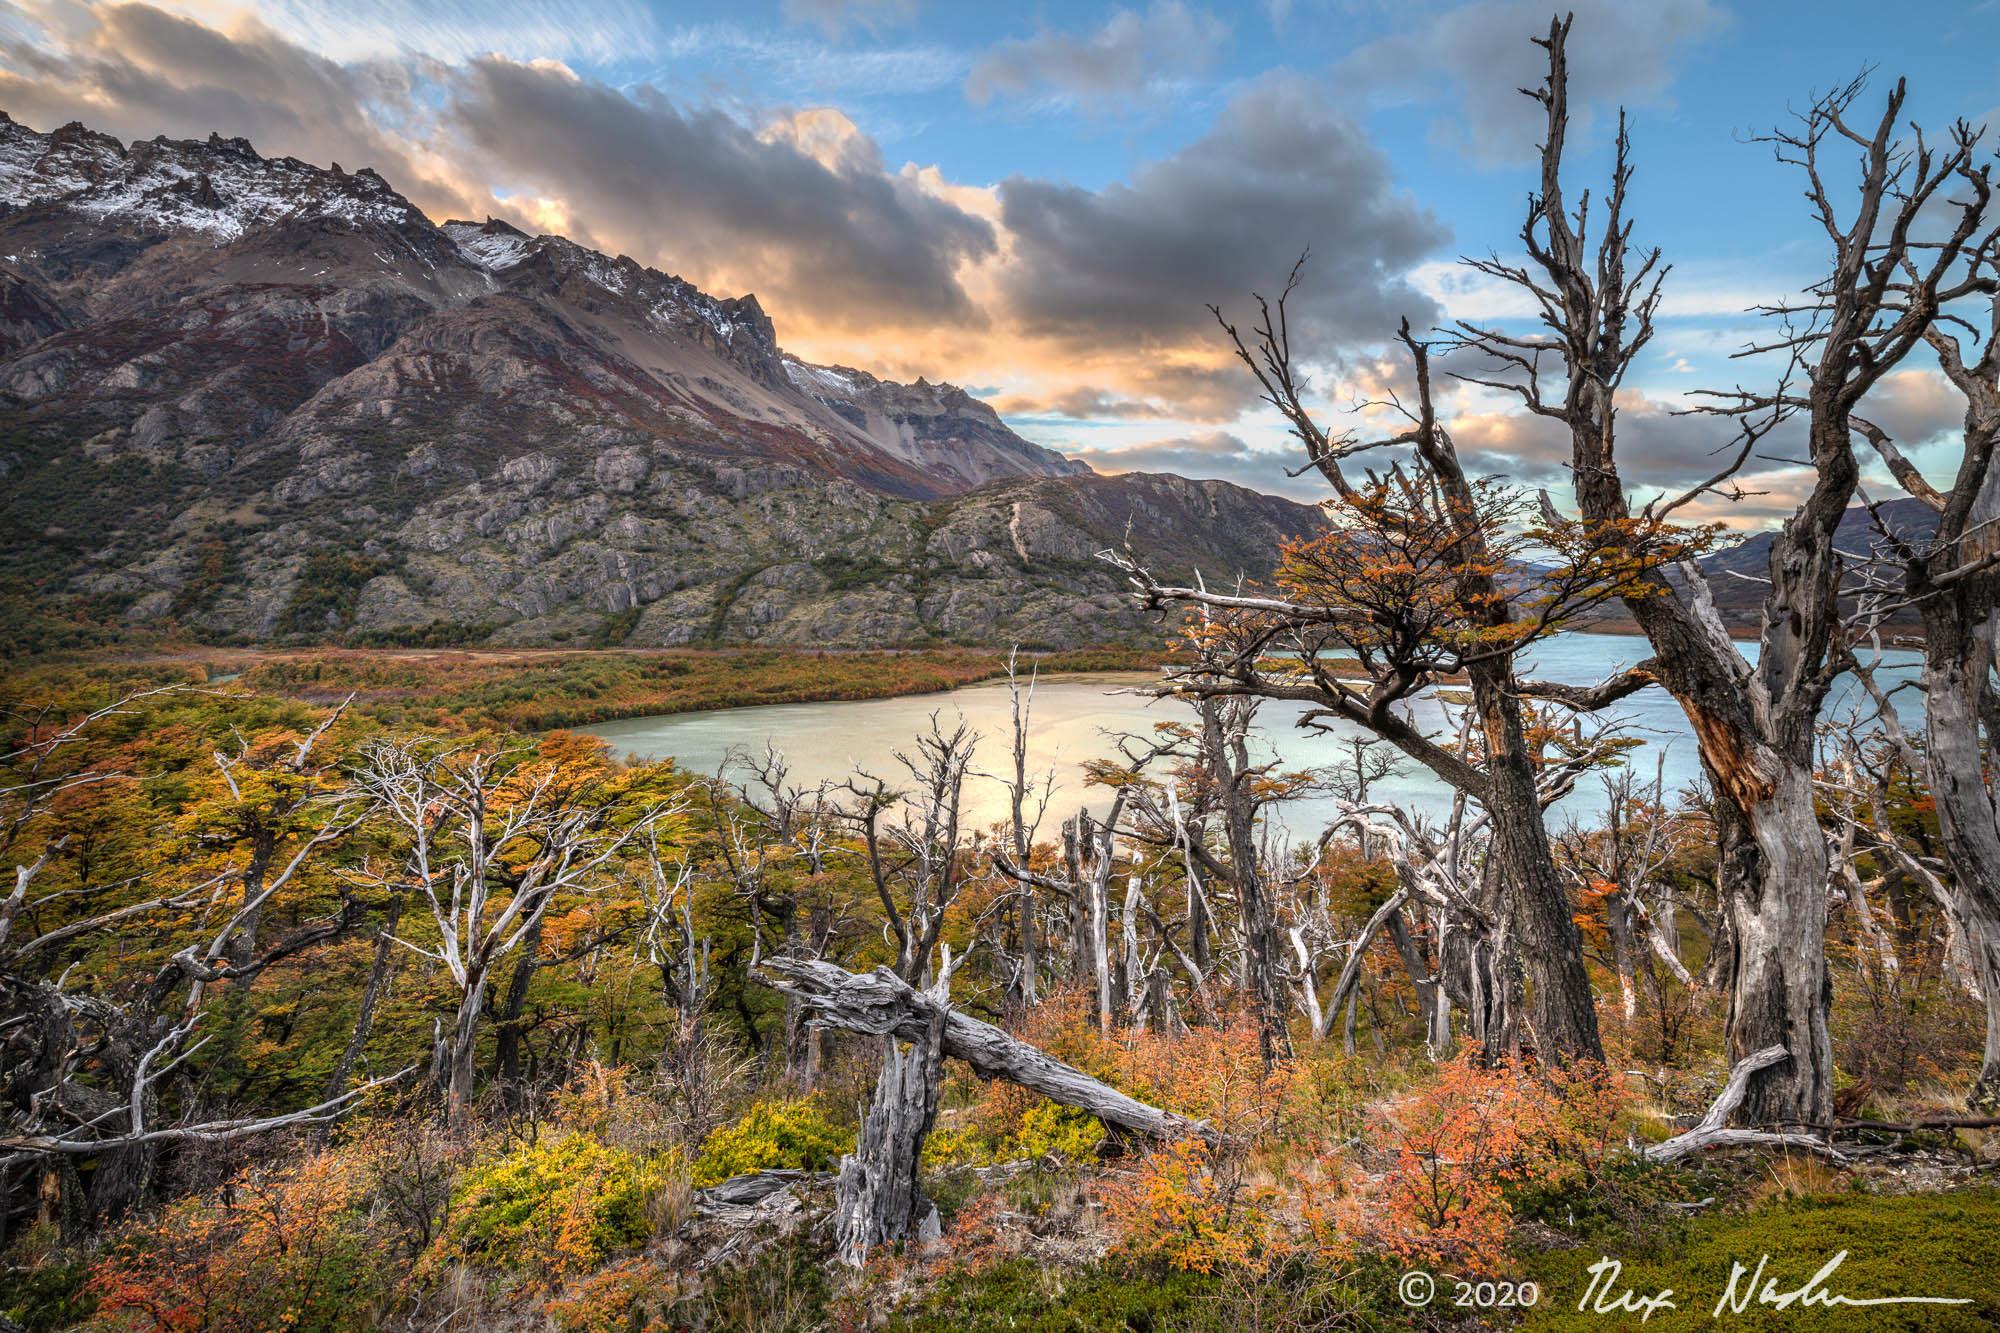 Lago Condor with Lenga Forest - Near El Chalten, Argentina